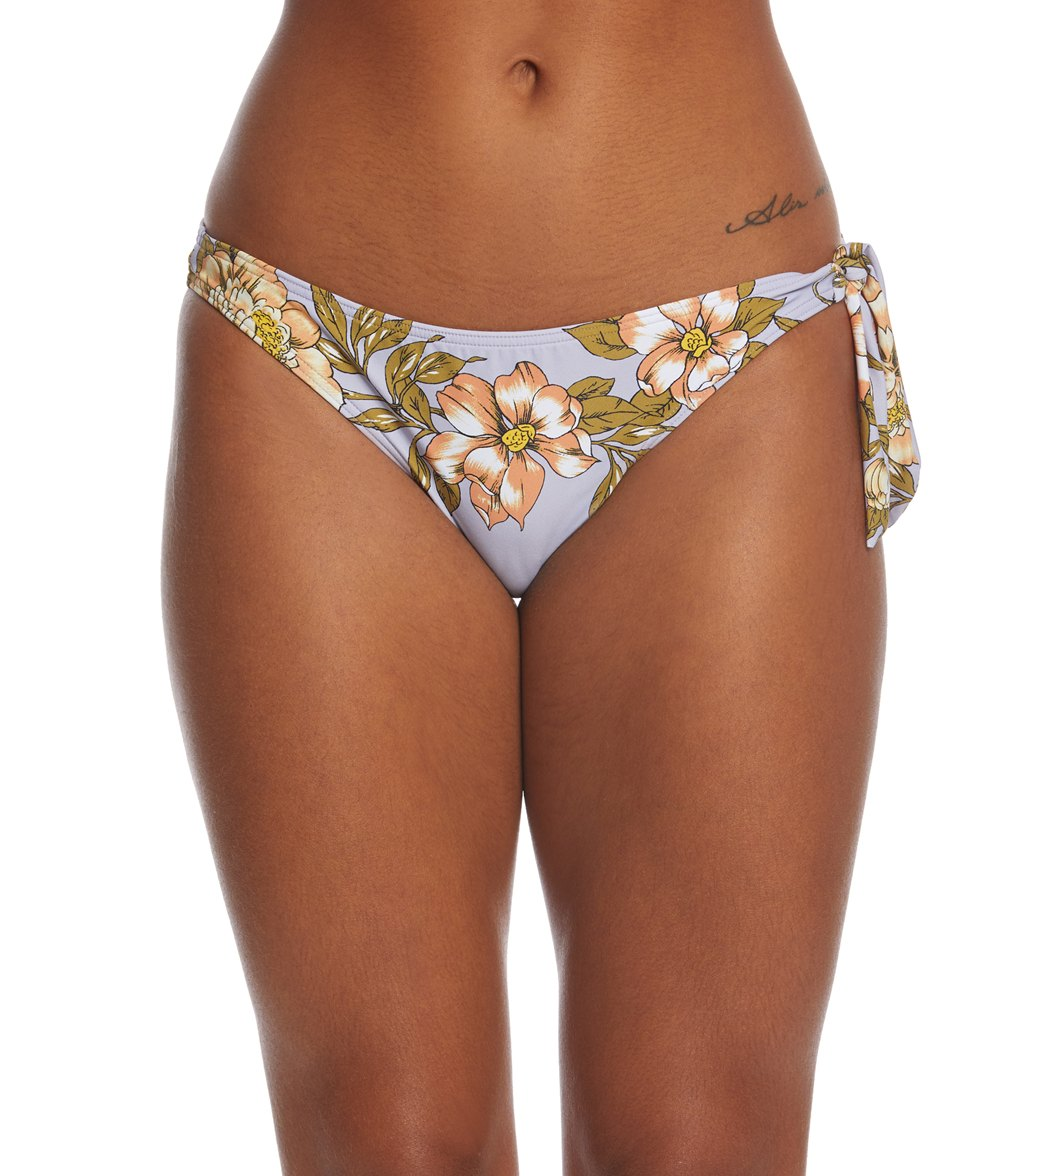 f0009f89d8 O'Neill Aloha Floral Knot Bikini Bottom at SwimOutlet.com